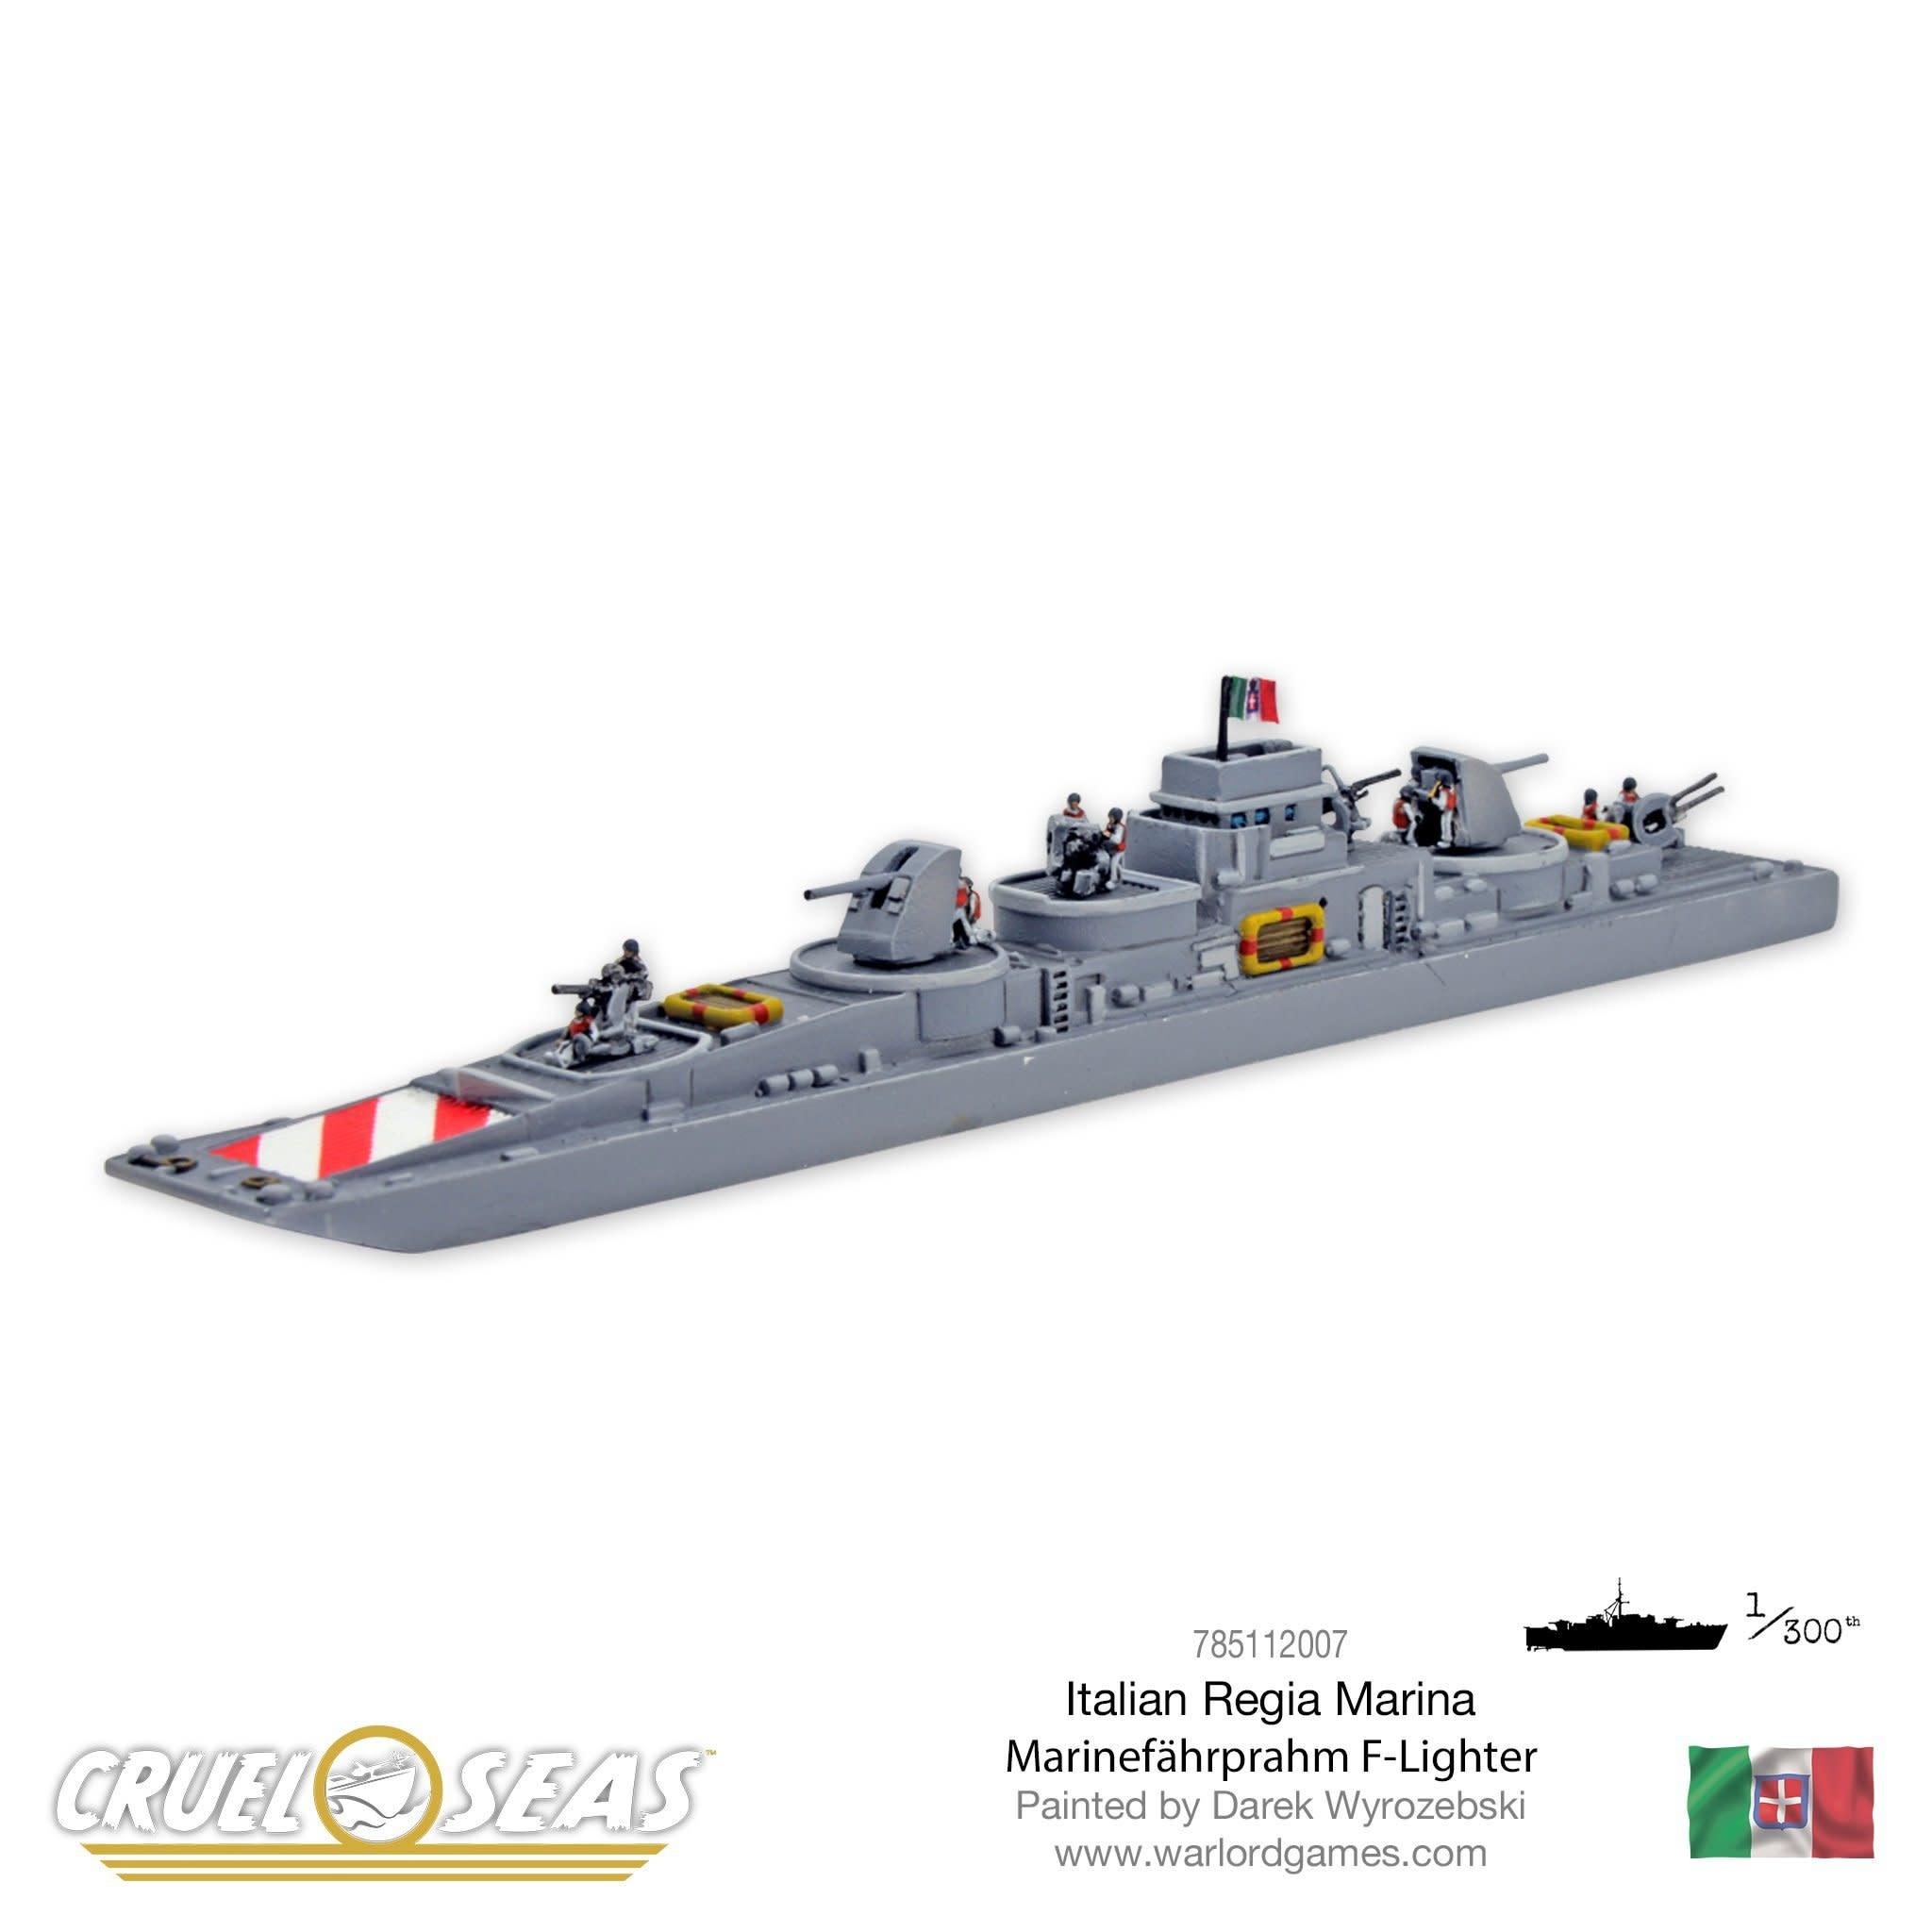 Warlord games Cruel Seas: Italian Marinefahrprahm F-Lighter